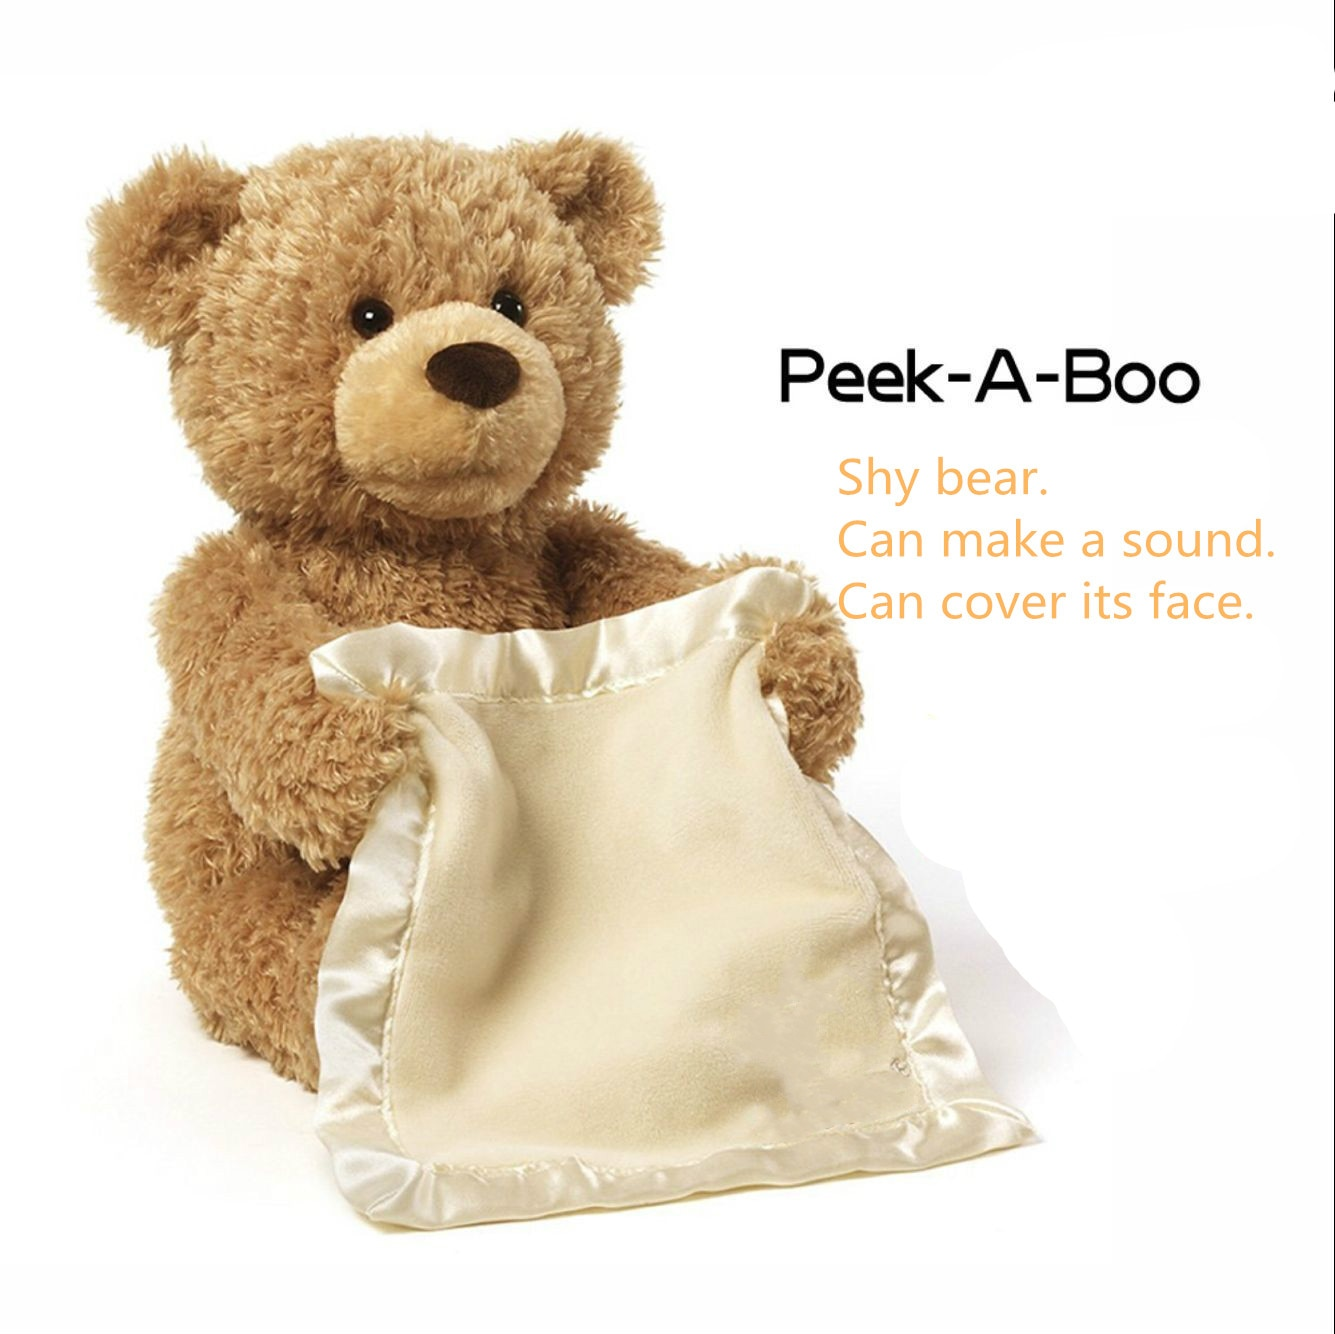 Children's Gifts Peep Bear Electric Facial Turning Shy Bear Plush Toy Talking Movable Bear Electric Plush Toy